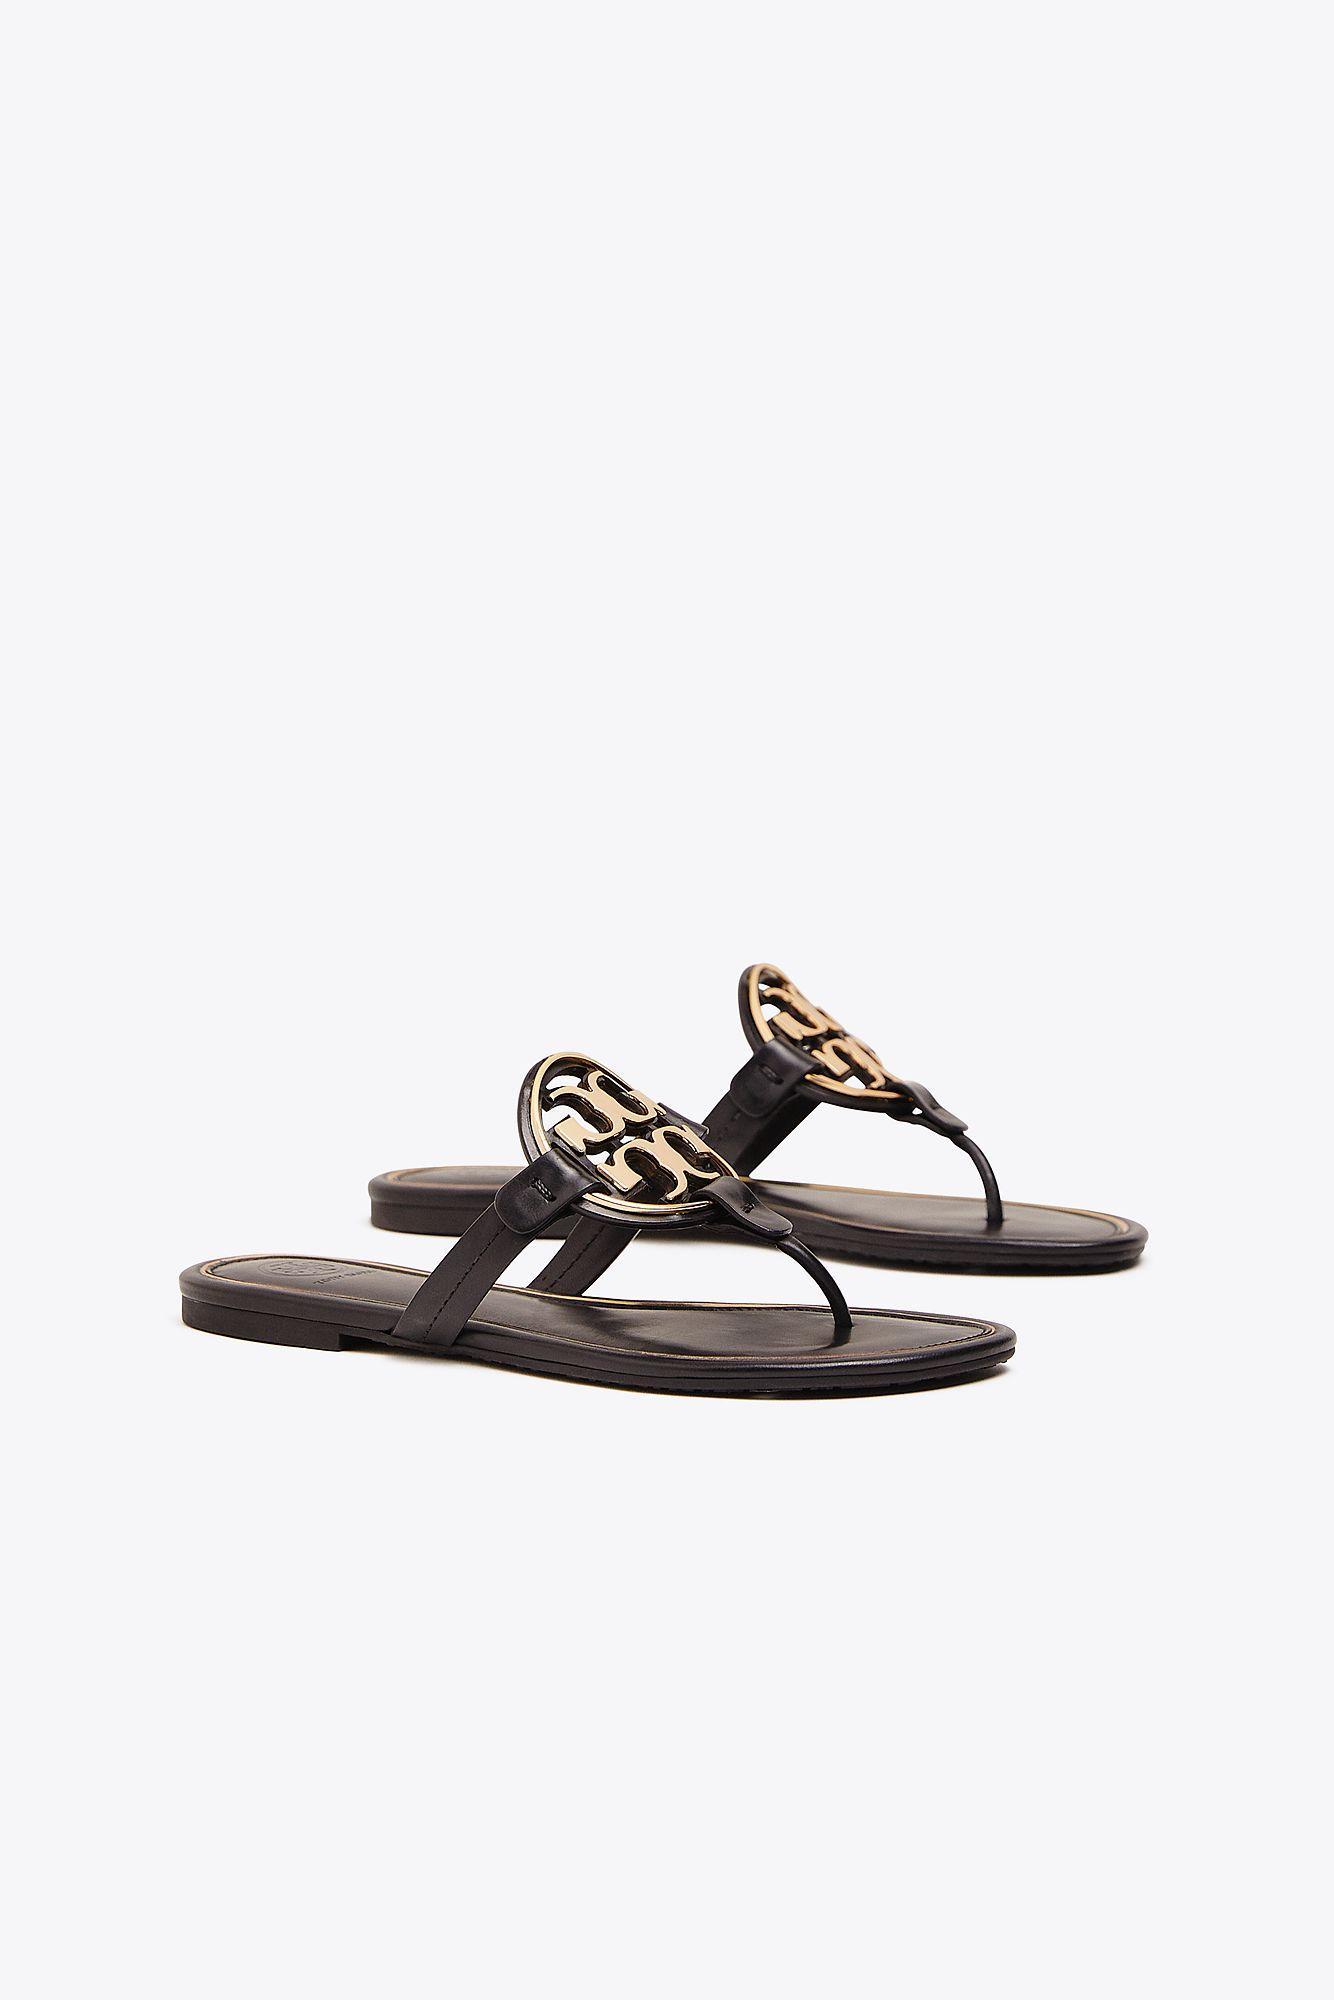 d8830a603cc5a7 Tory Burch Miller Flat Metal Logo Slide Sandals in Black - Lyst